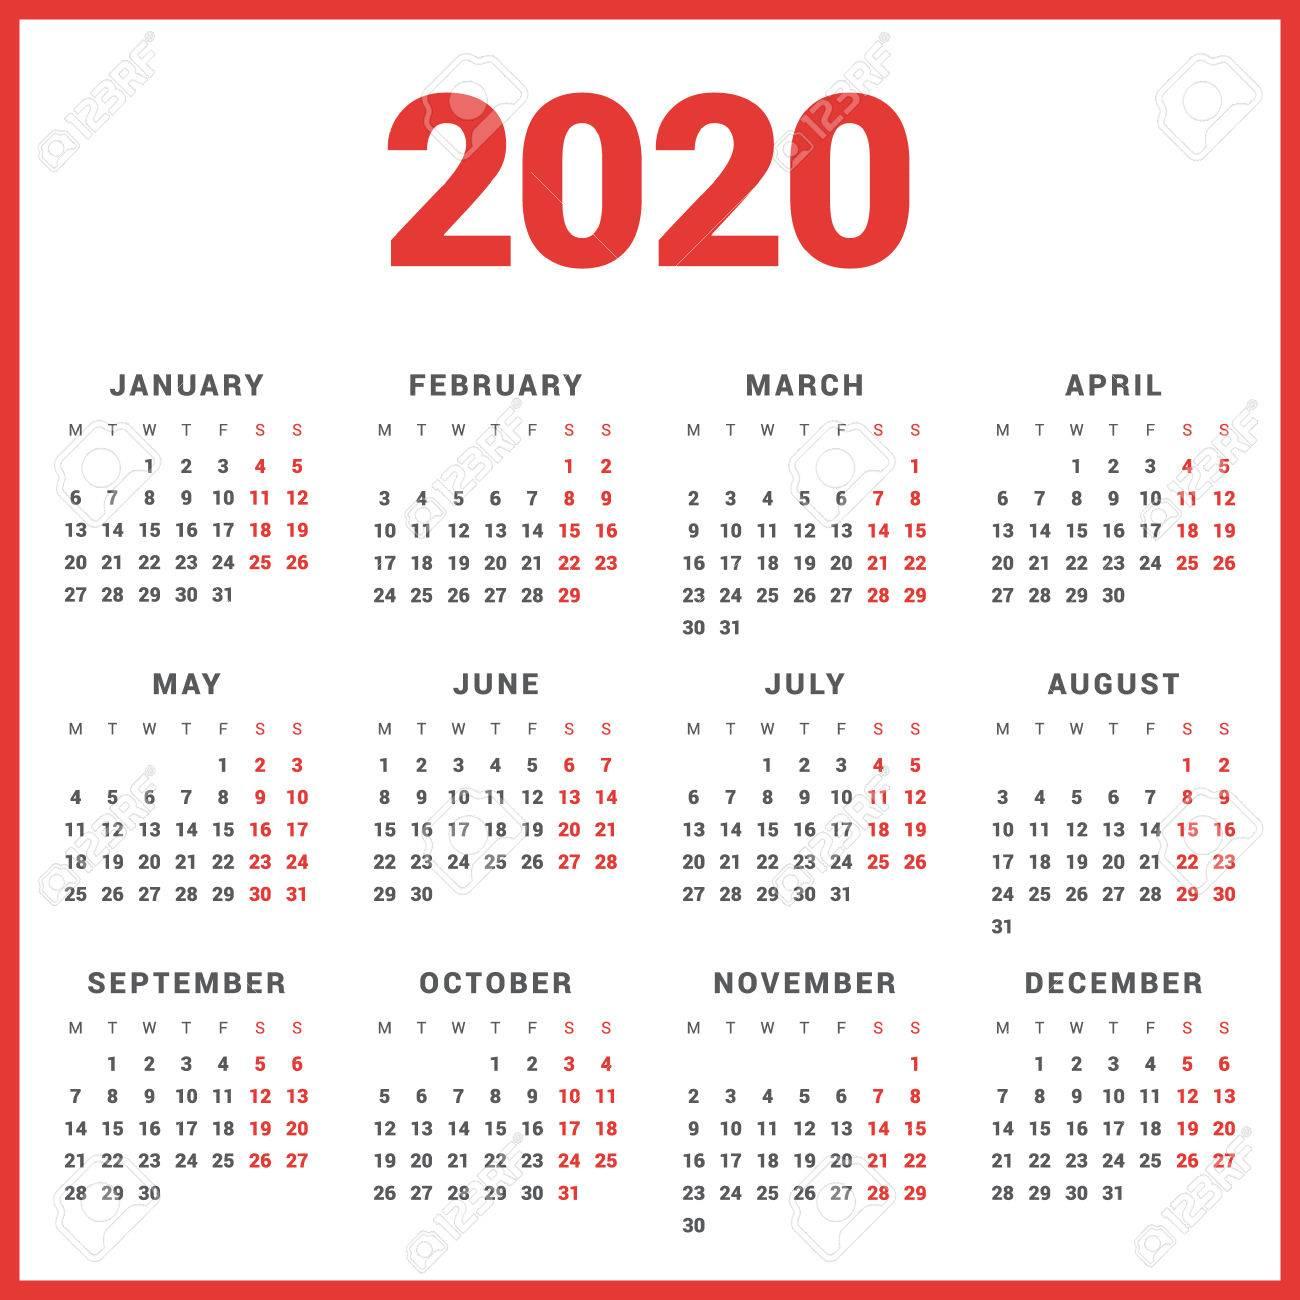 2020 Calendar Starting On Monday